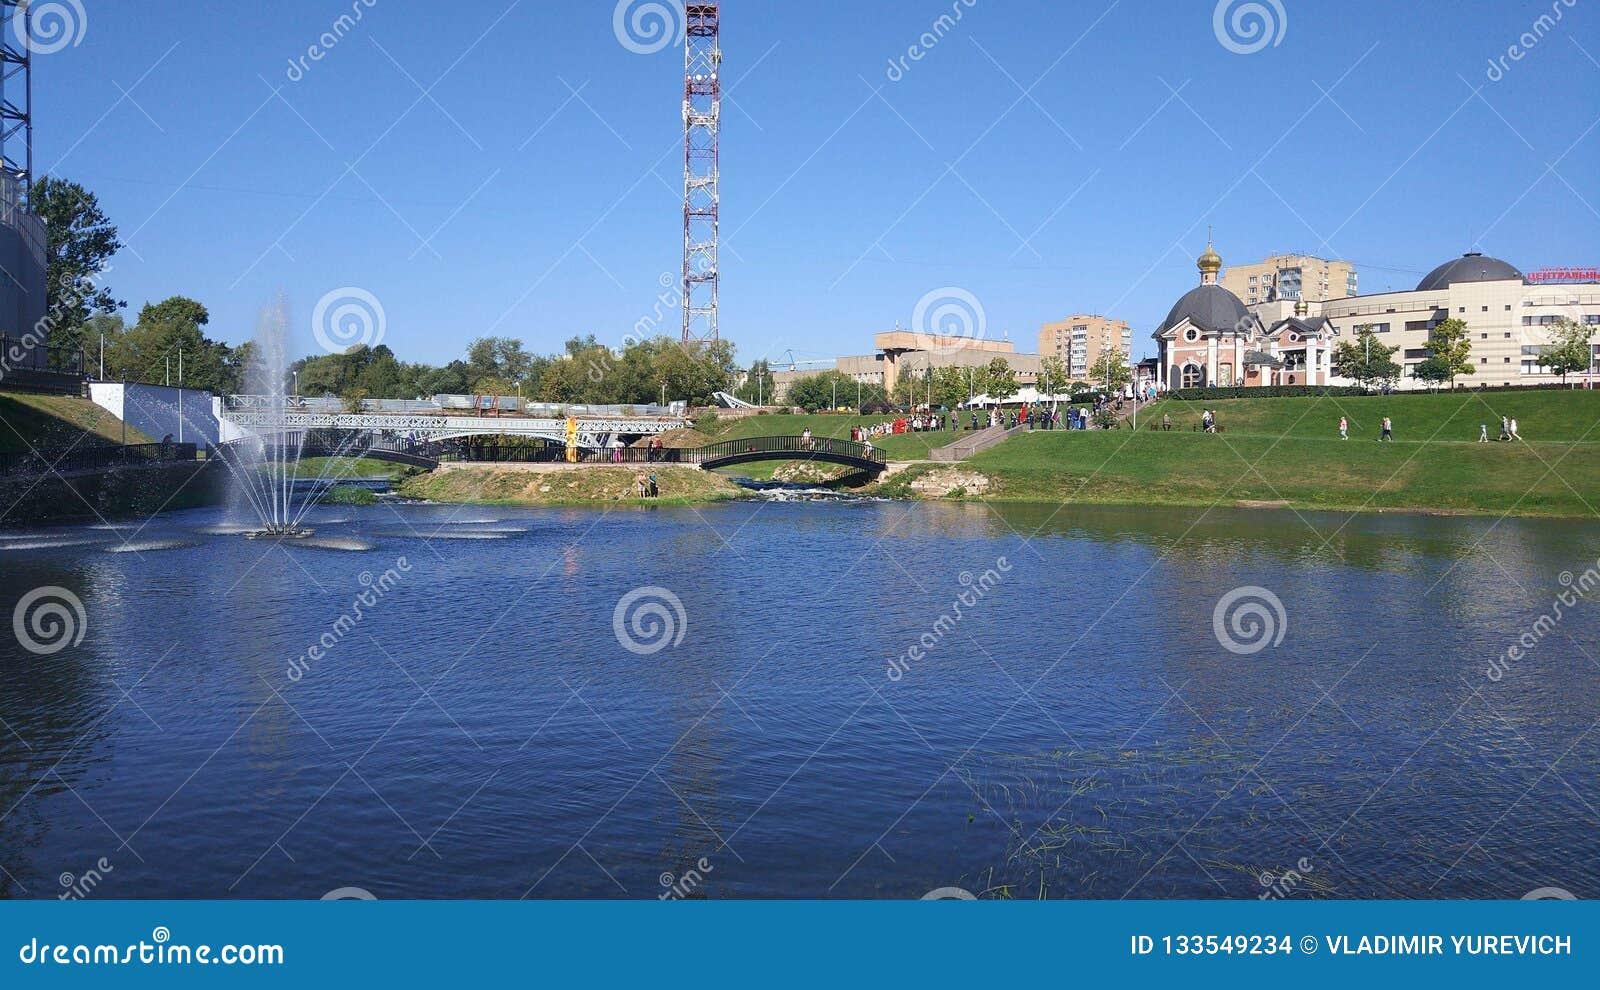 Embankment of the Klyazma river in the city of Shchelkovo, Moscow region.